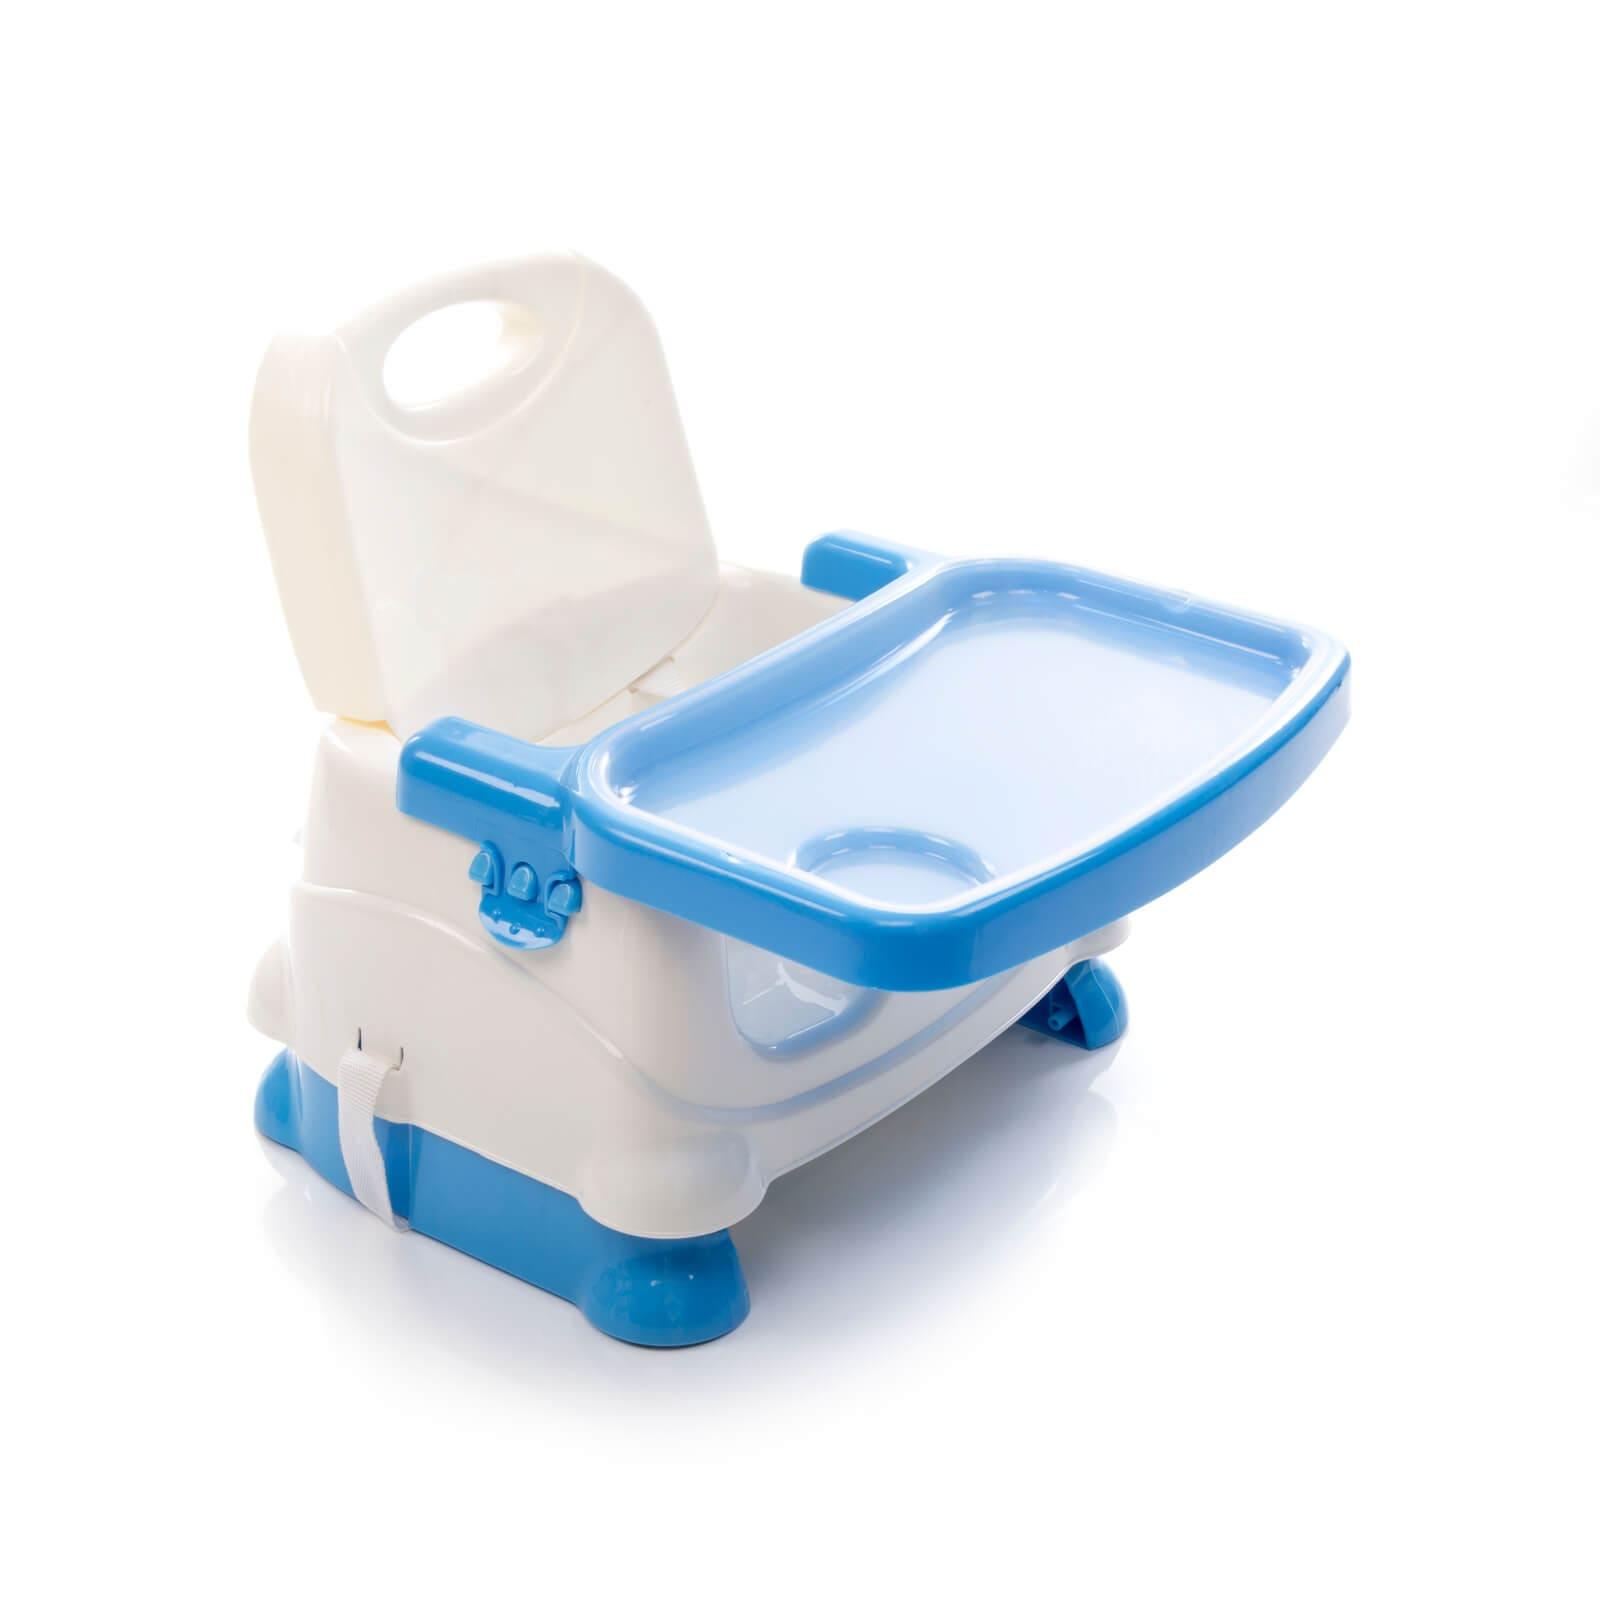 Cadeira Alimentação Portátil  Voyage Fun - Azul